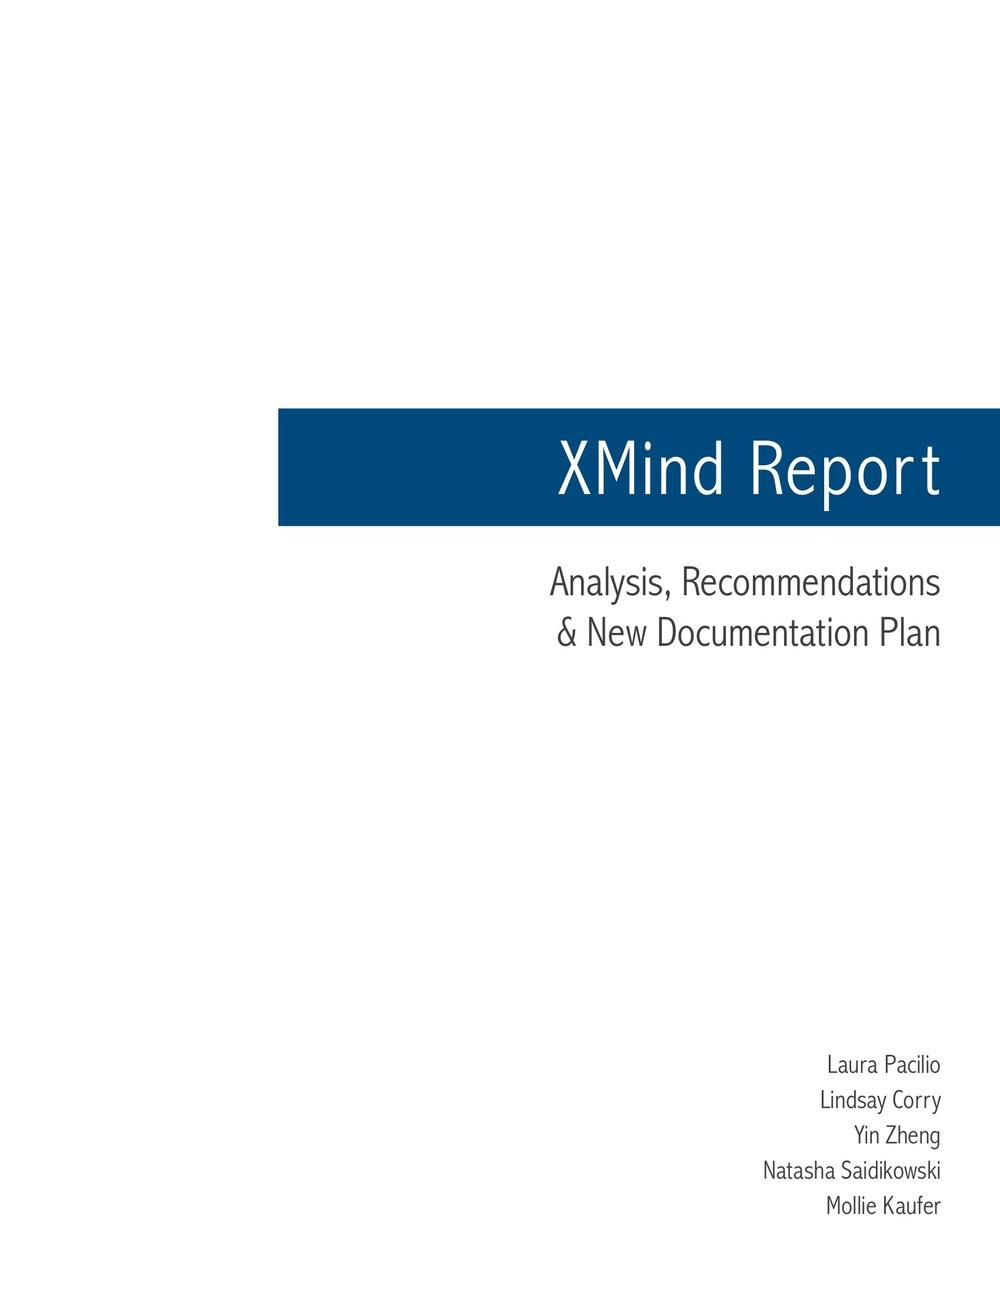 XMind Final Report_4-23-15 1.jpeg